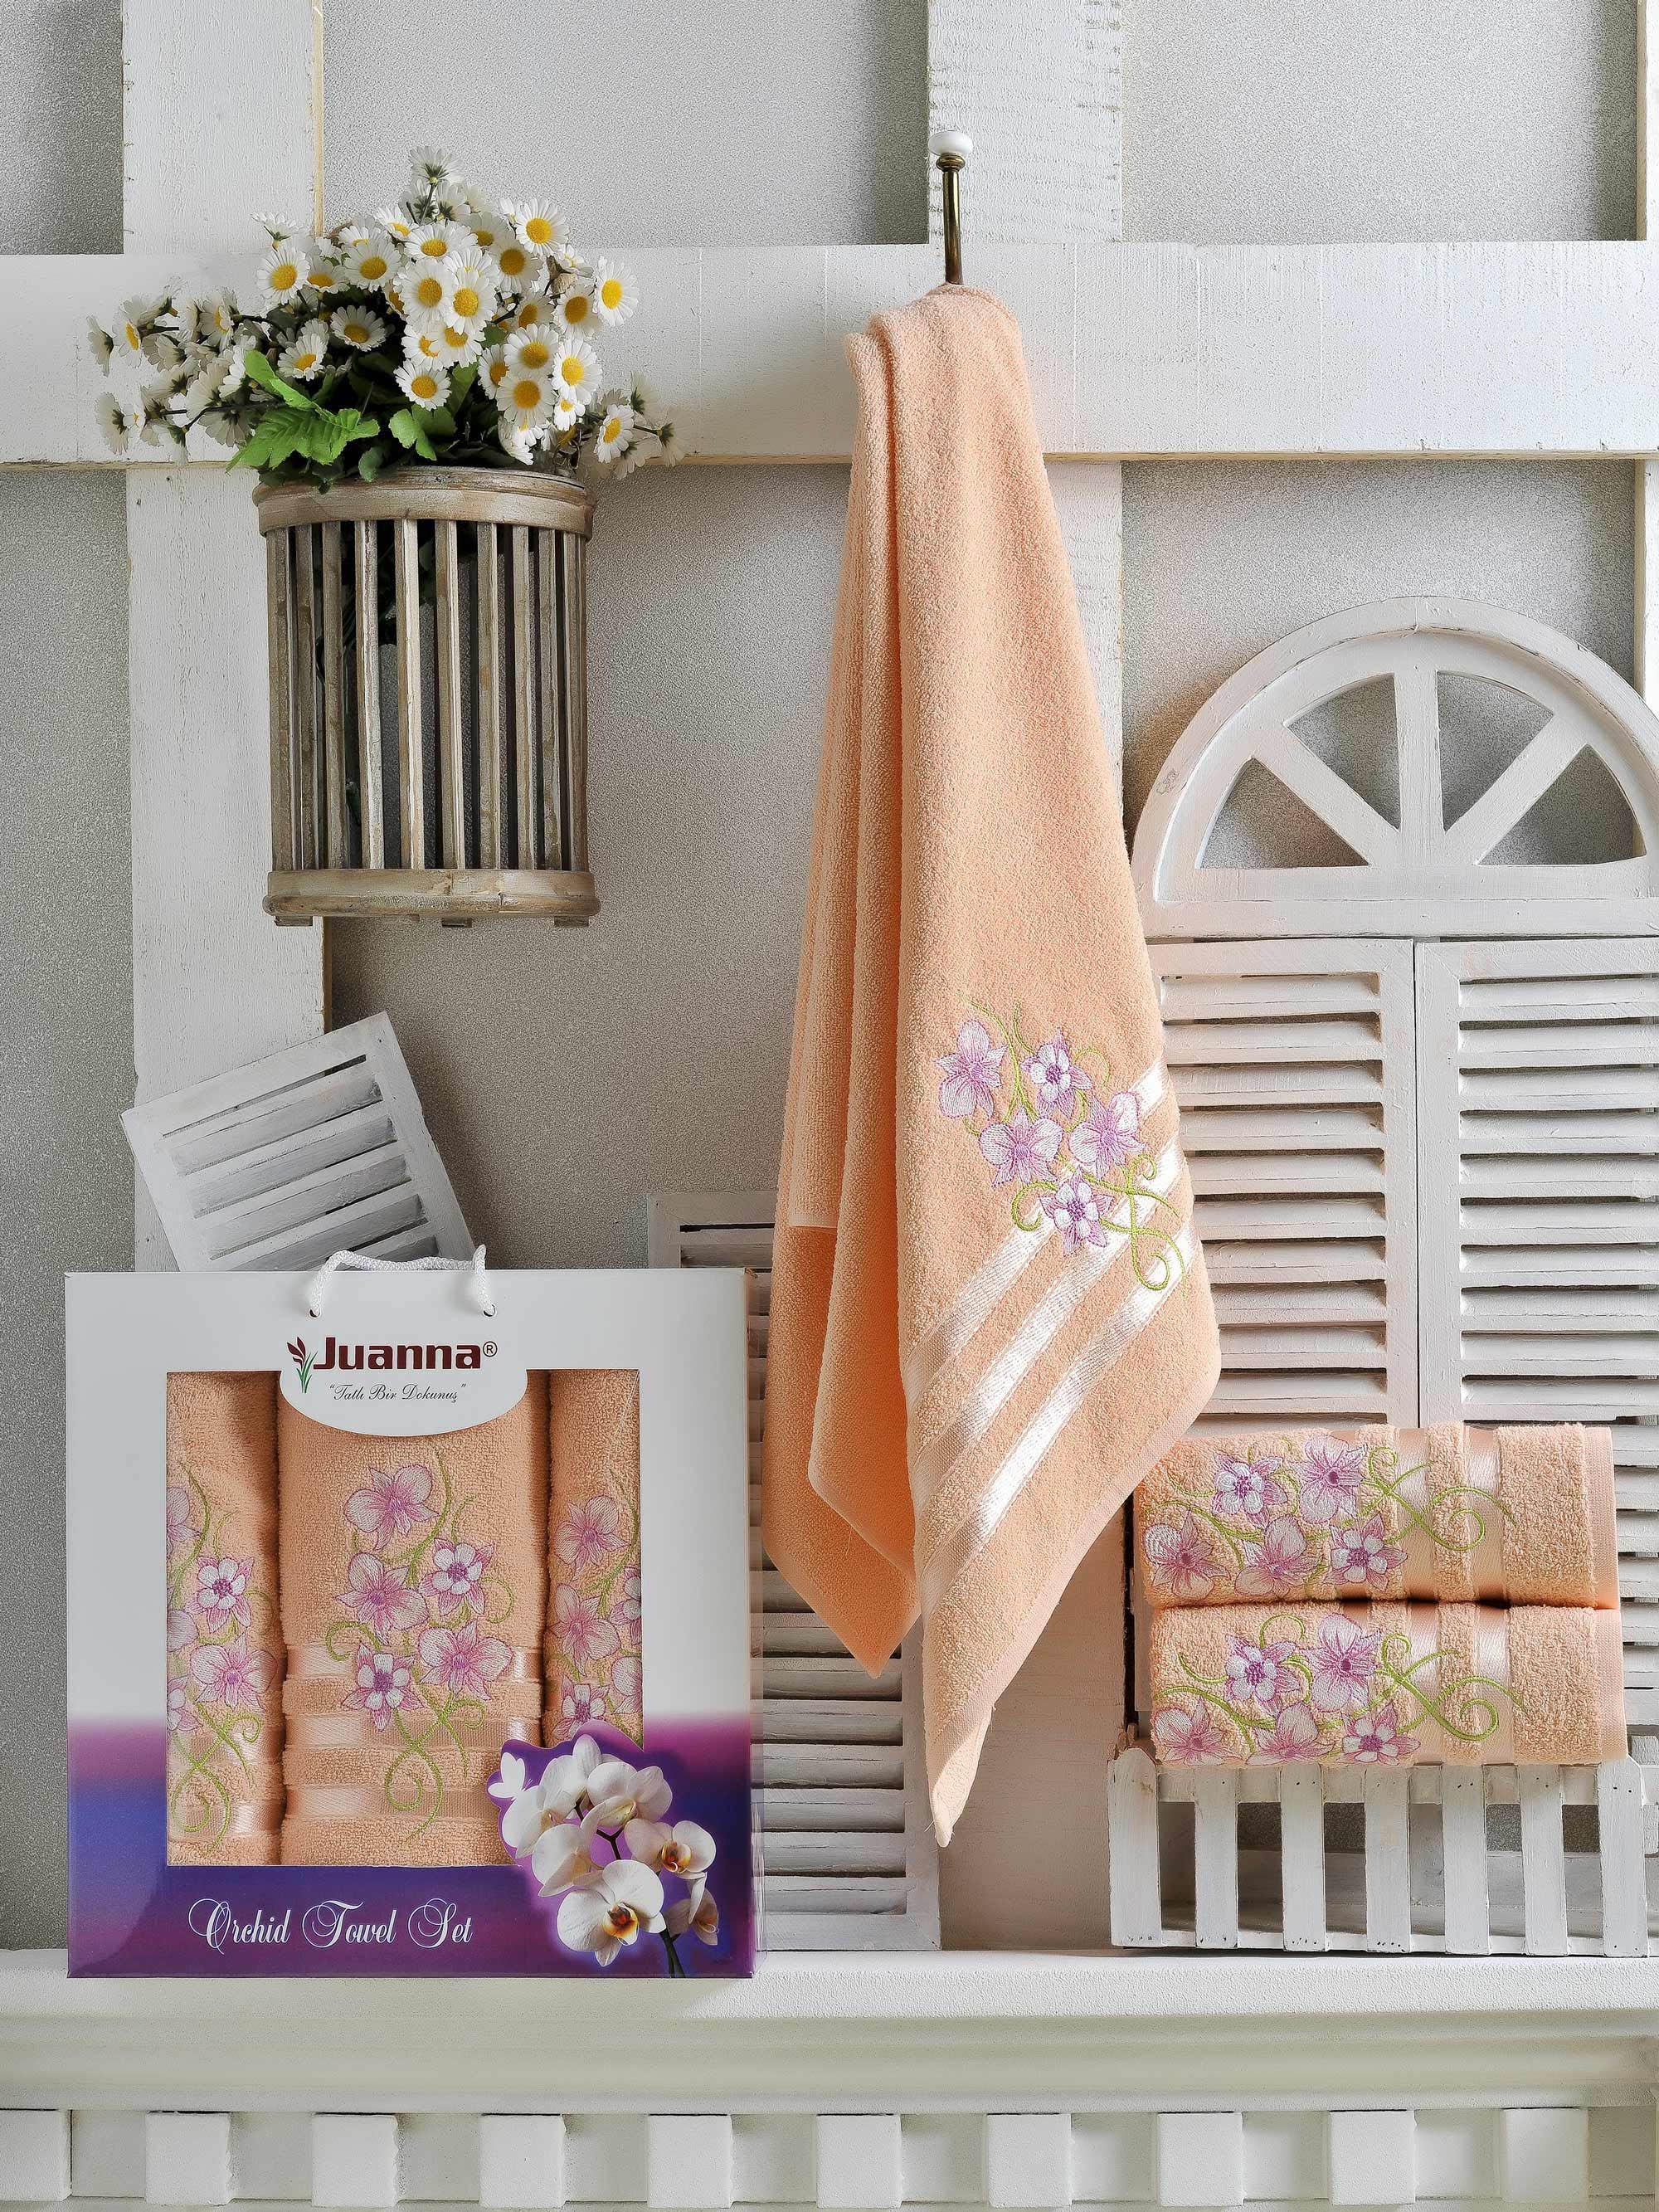 Полотенца Juanna Набор из 3 полотенец Orkide Цвет: Персиковый набор из 3 полотенец merzuka sakura 50х90 2 70х140 8432 терракотовый